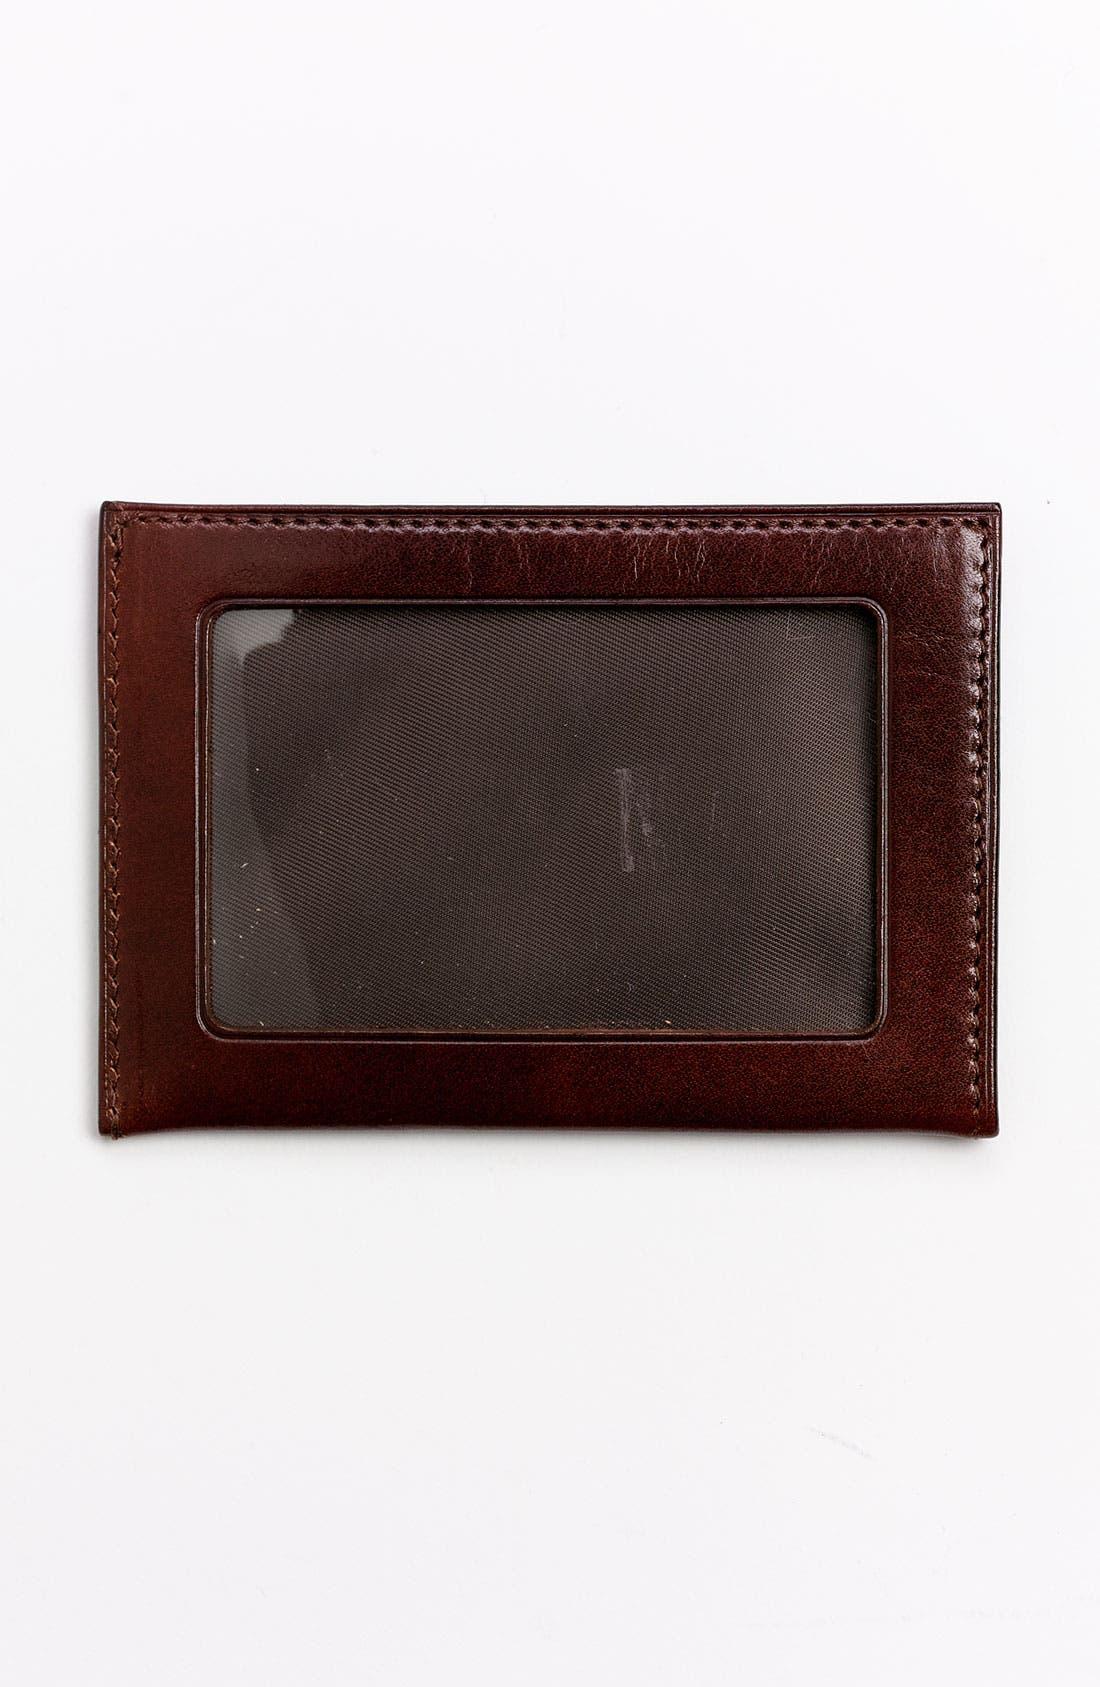 'Old Leather' Weekend Wallet,                             Alternate thumbnail 2, color,                             Dark Brown